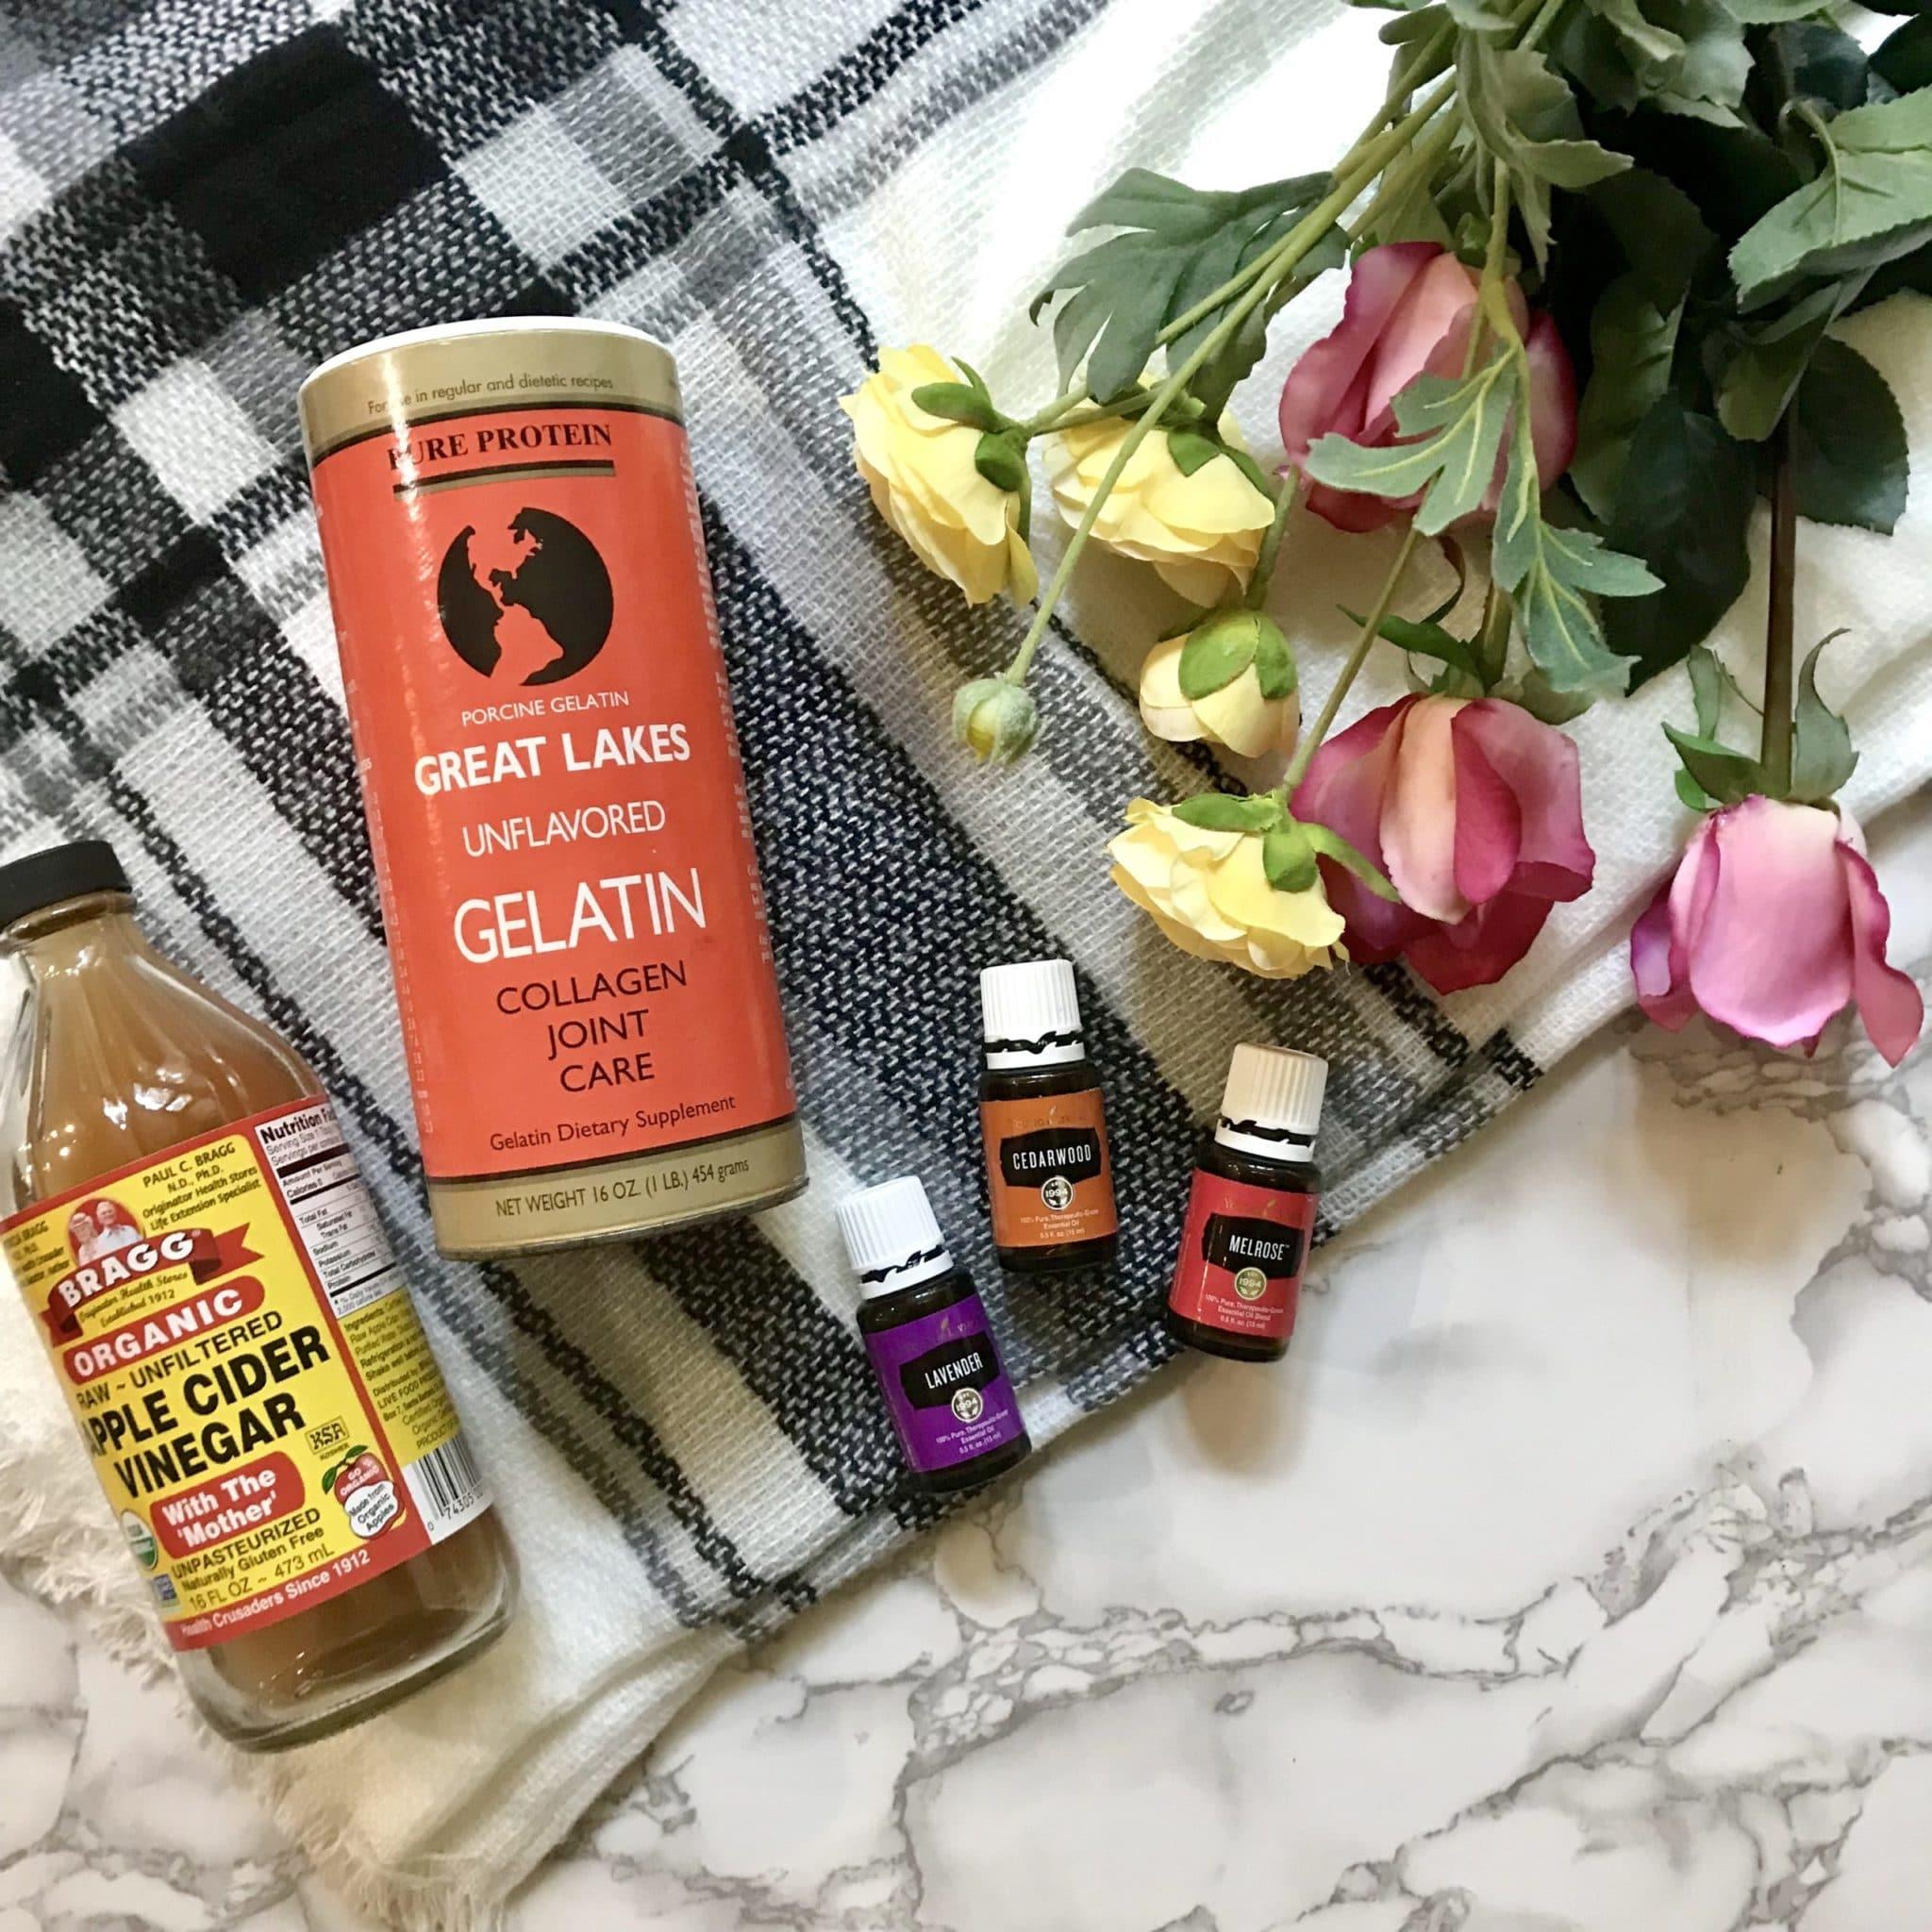 DIY Gelatin Hair Protein Treatment - My